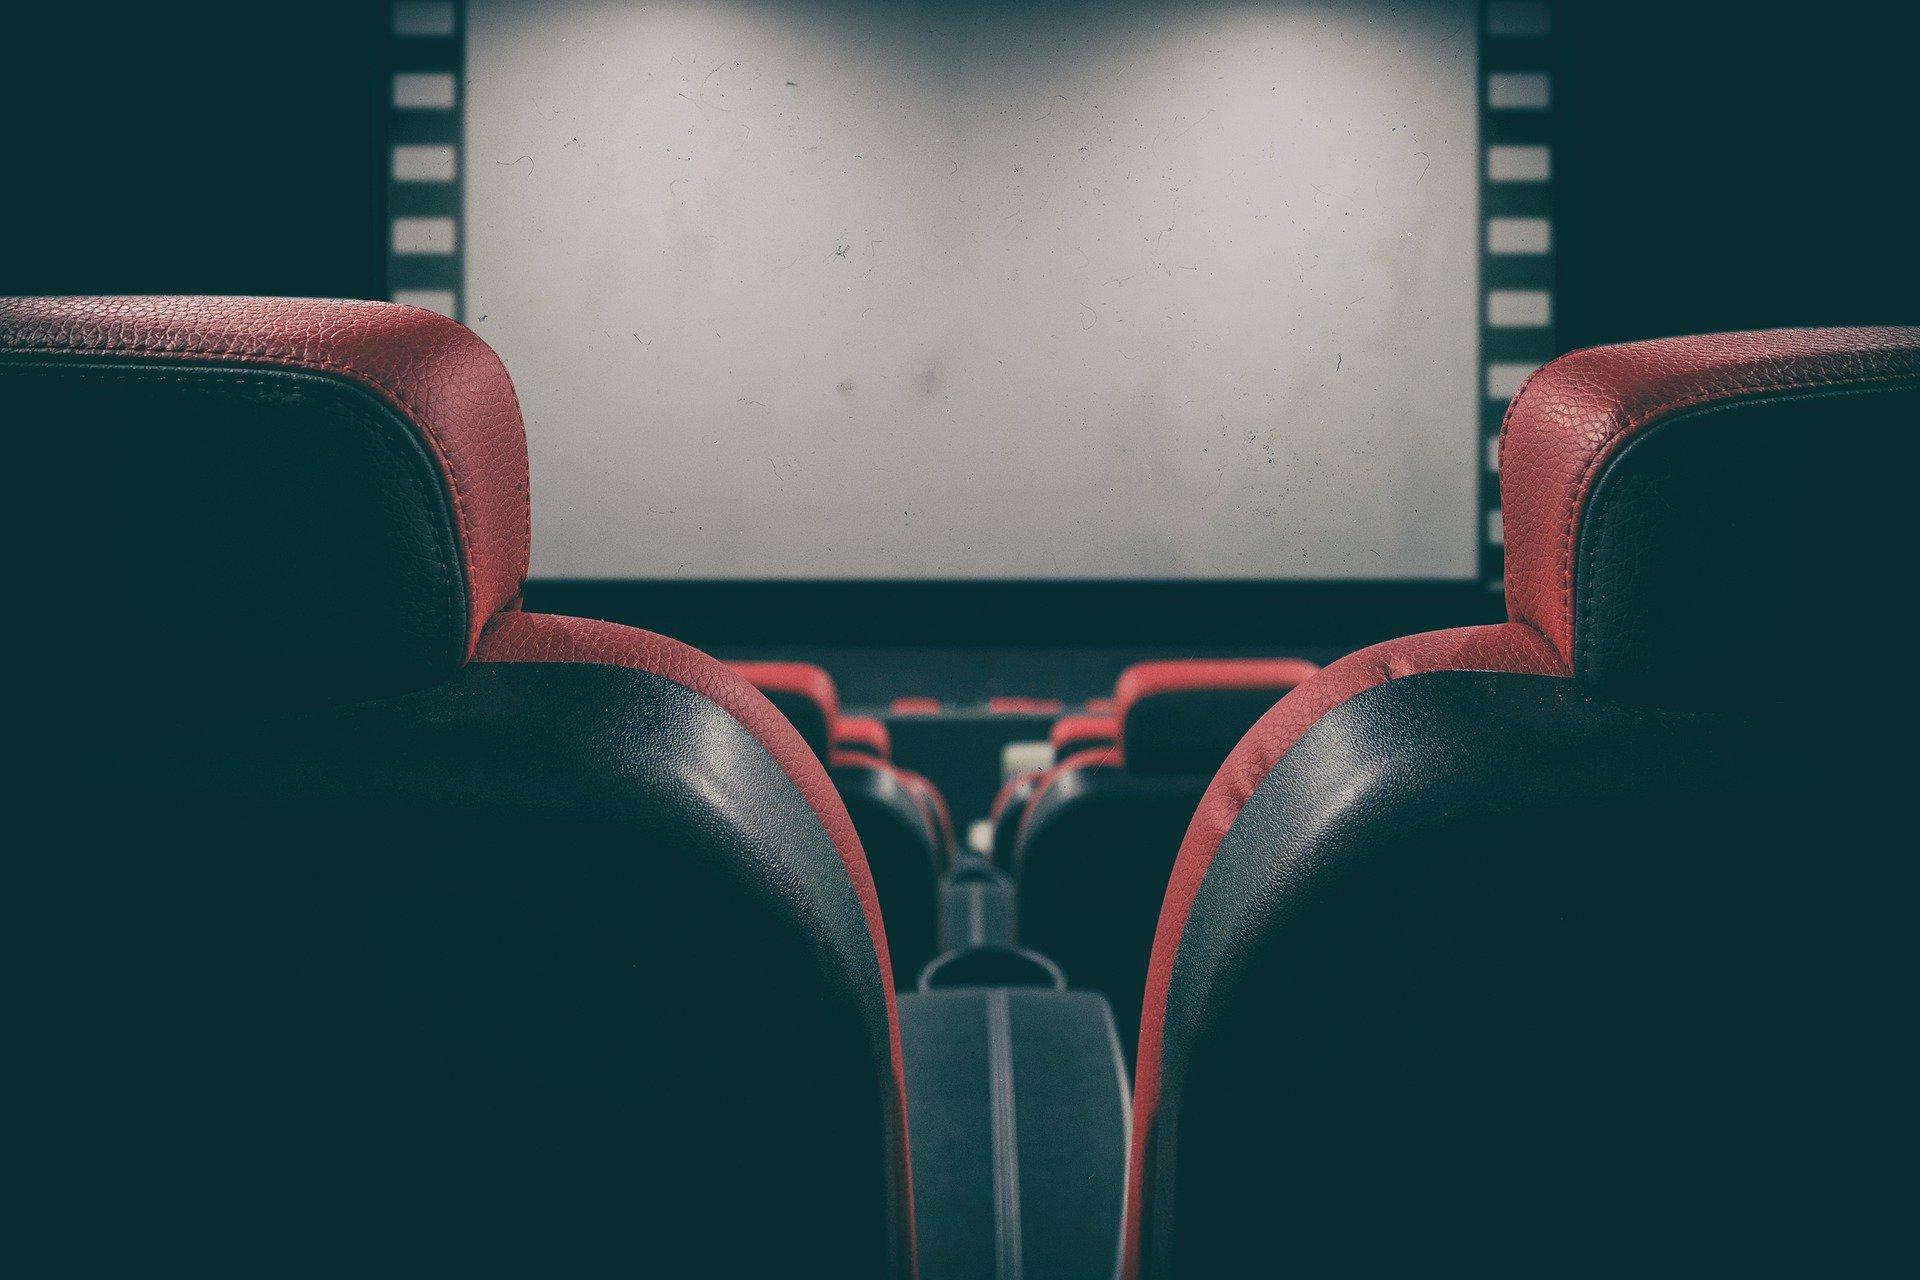 Leinwand im Kinosaal für Sprecherjob